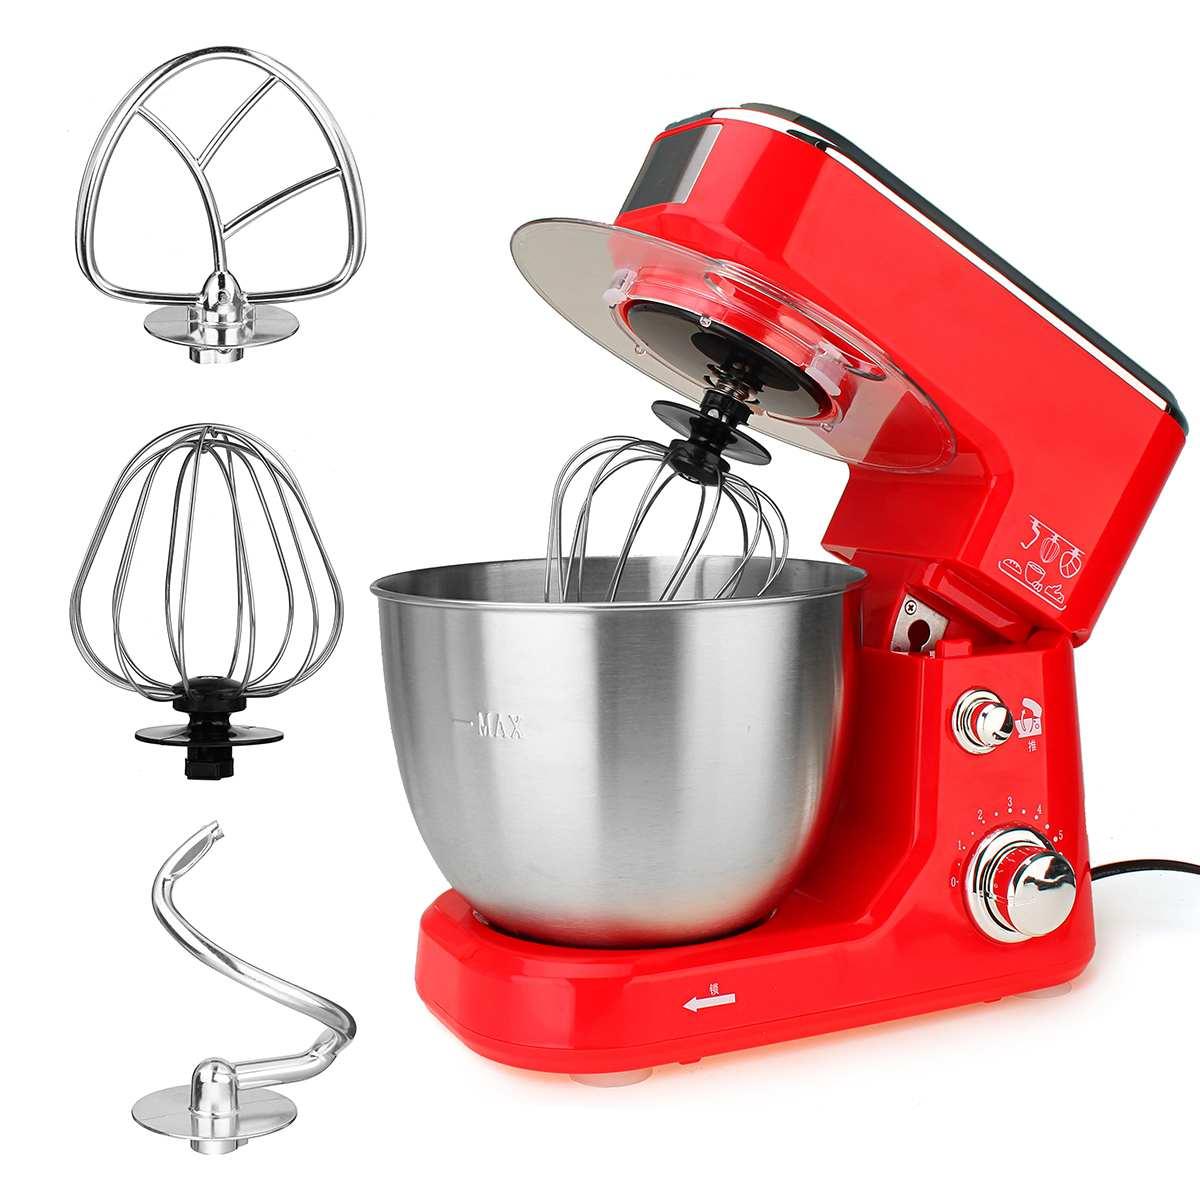 Tabletop 4L Bowl-Lift Mixer Kitchen Food Milkshake/Cake Kneading Machine Blenders Eggs Beater Home Smoothie Maker Tools